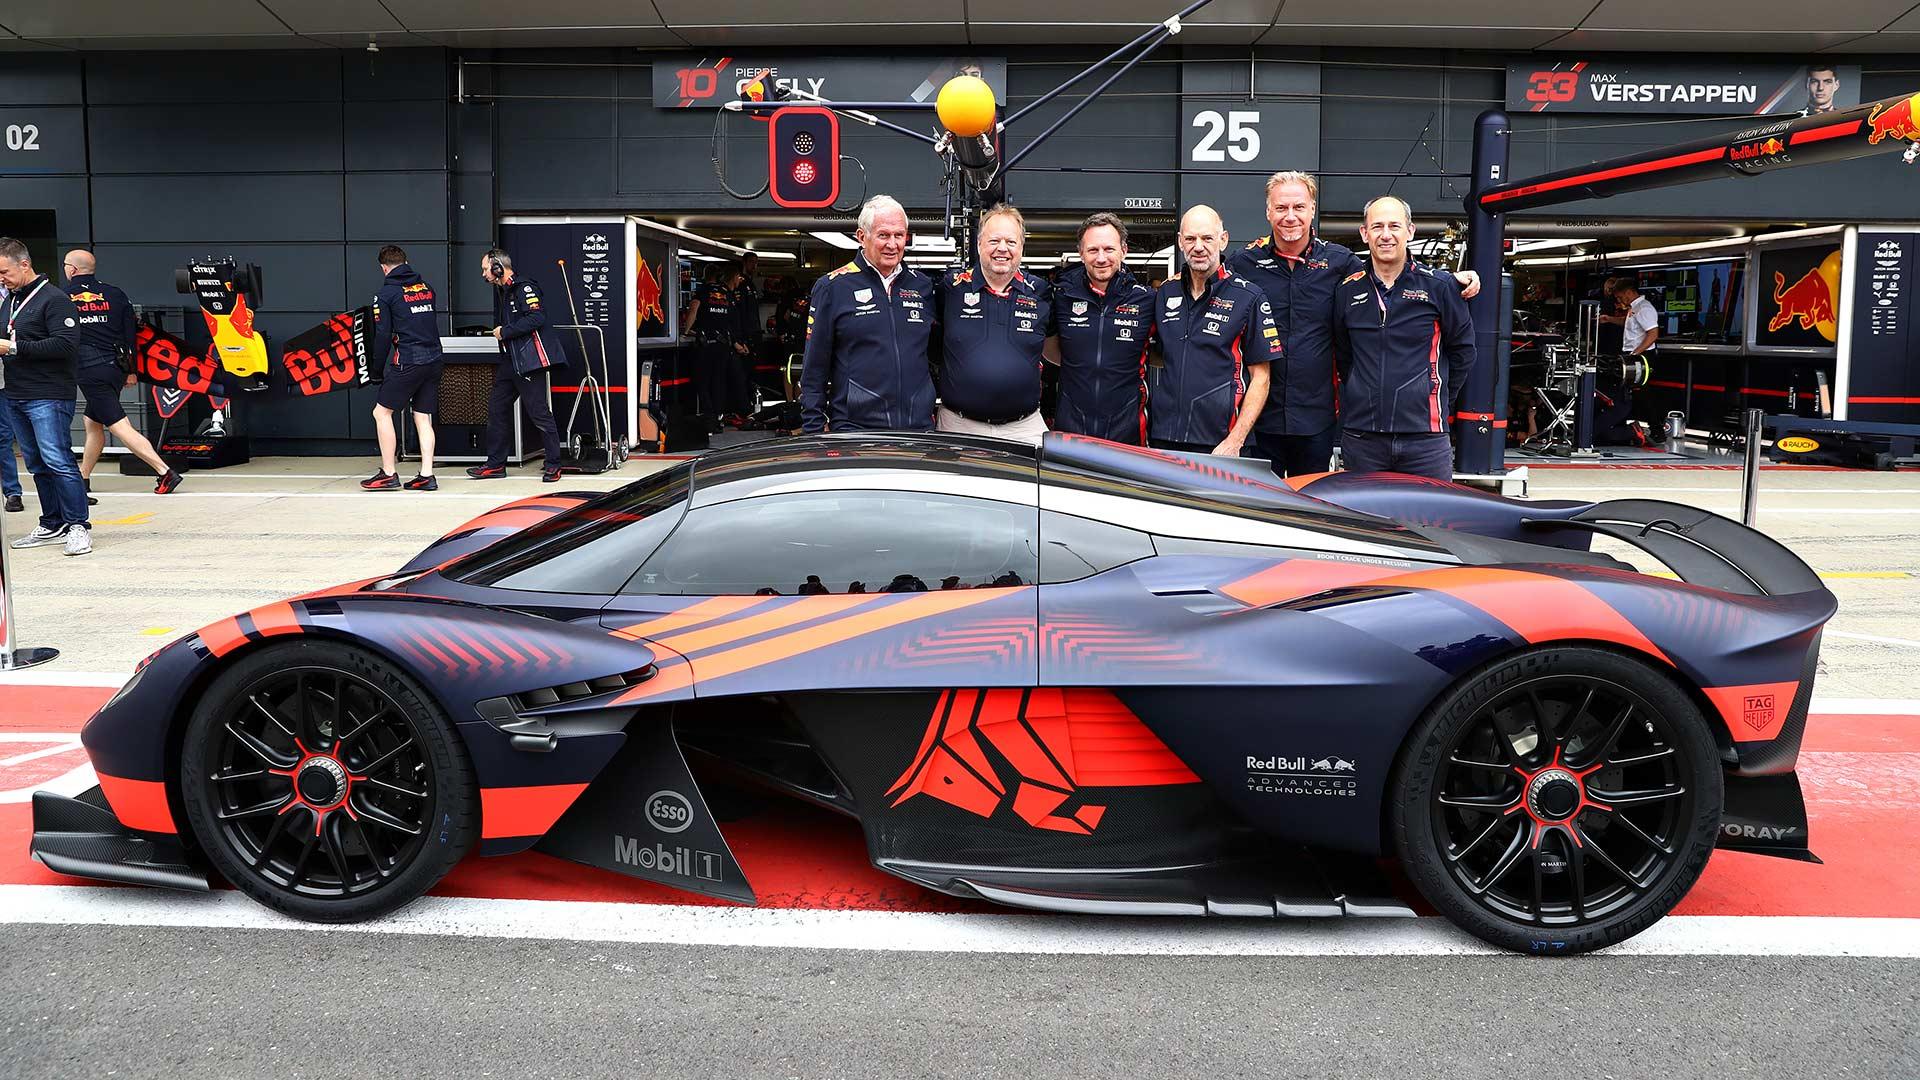 Aston Martin Valkyrie Silverstone public debut